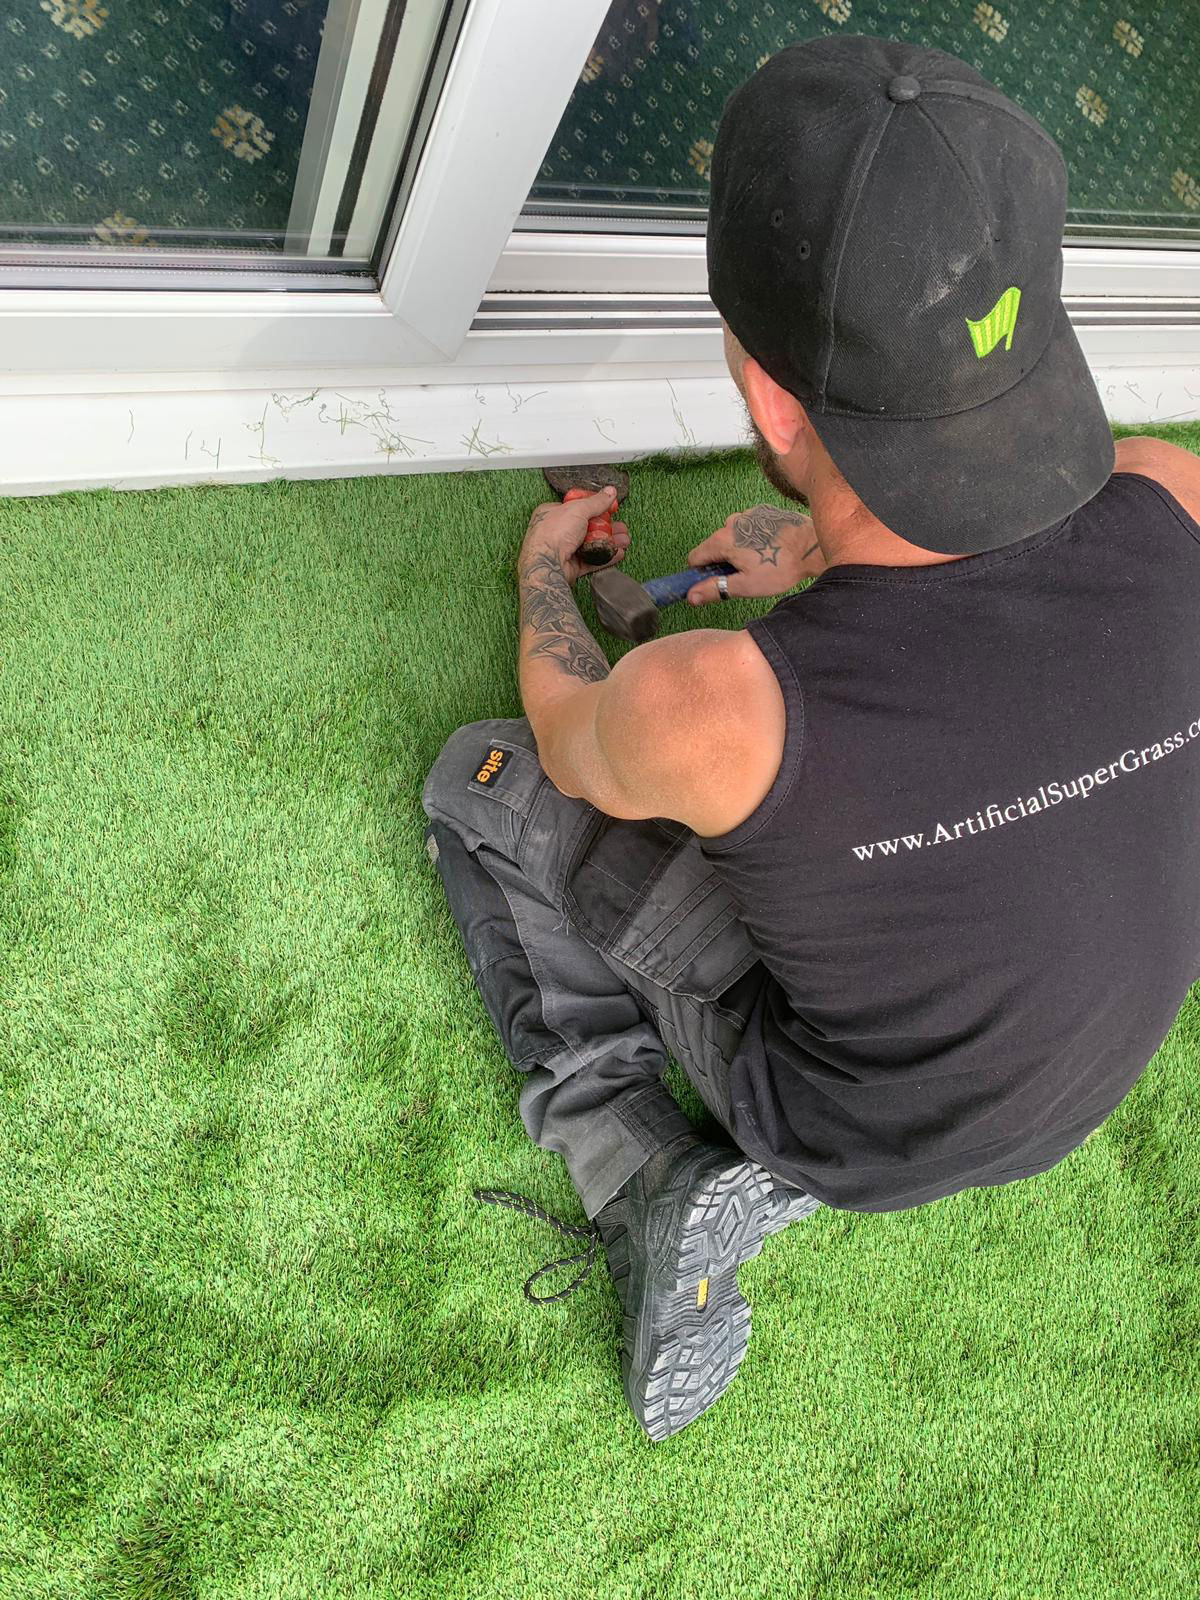 Astro Turf Cumbria Artificial Super Grass